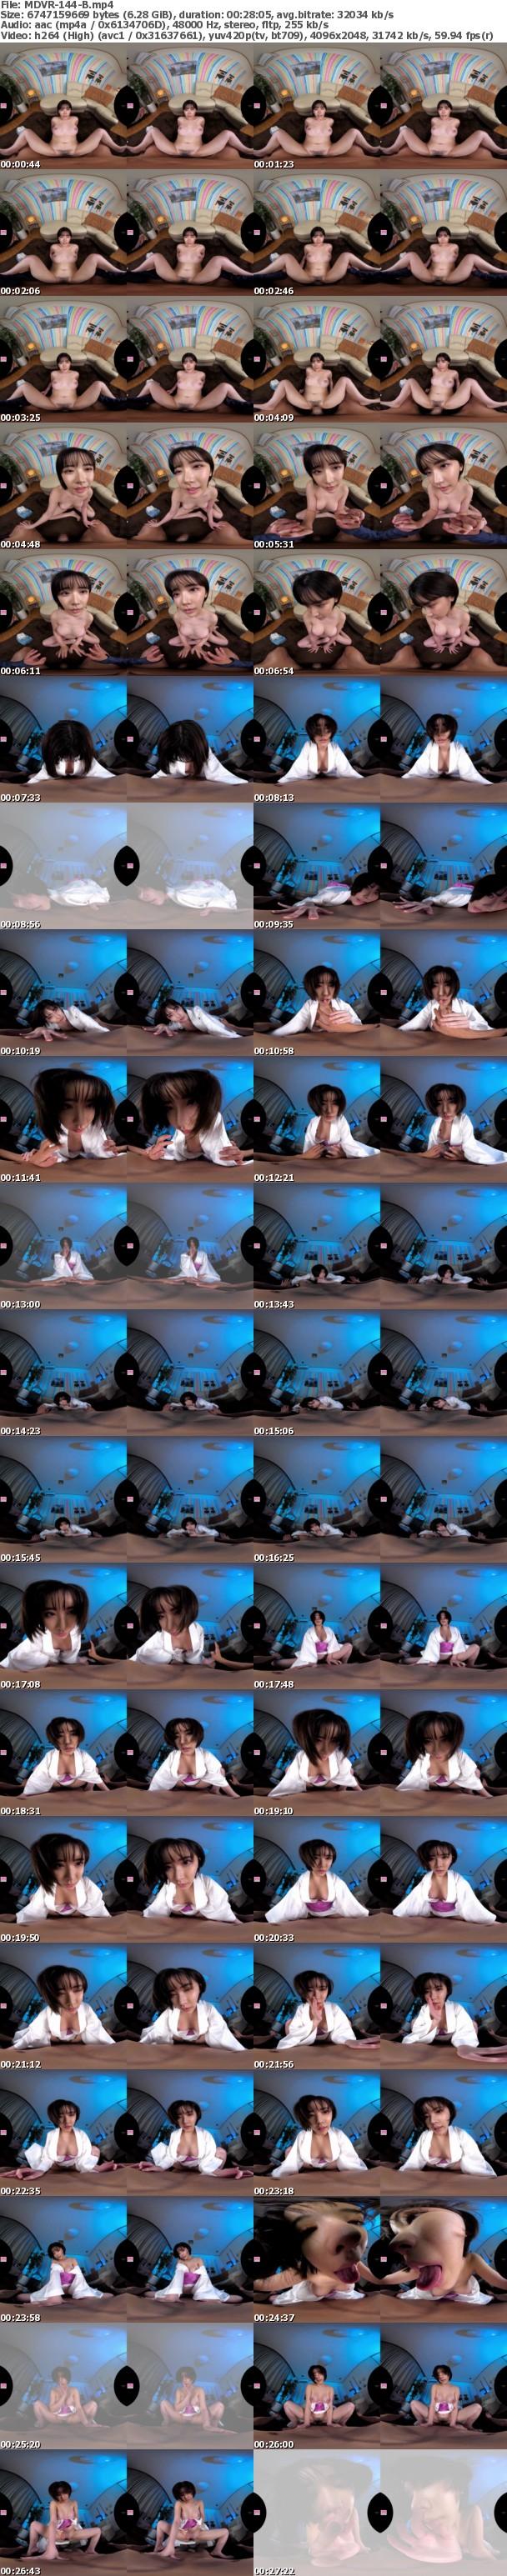 (VR) MDVR-144 【閲覧注意】ほぼノーカット昔話VR 雪女 深田えいみ完全憑依 バーチャルホラーSEX体験